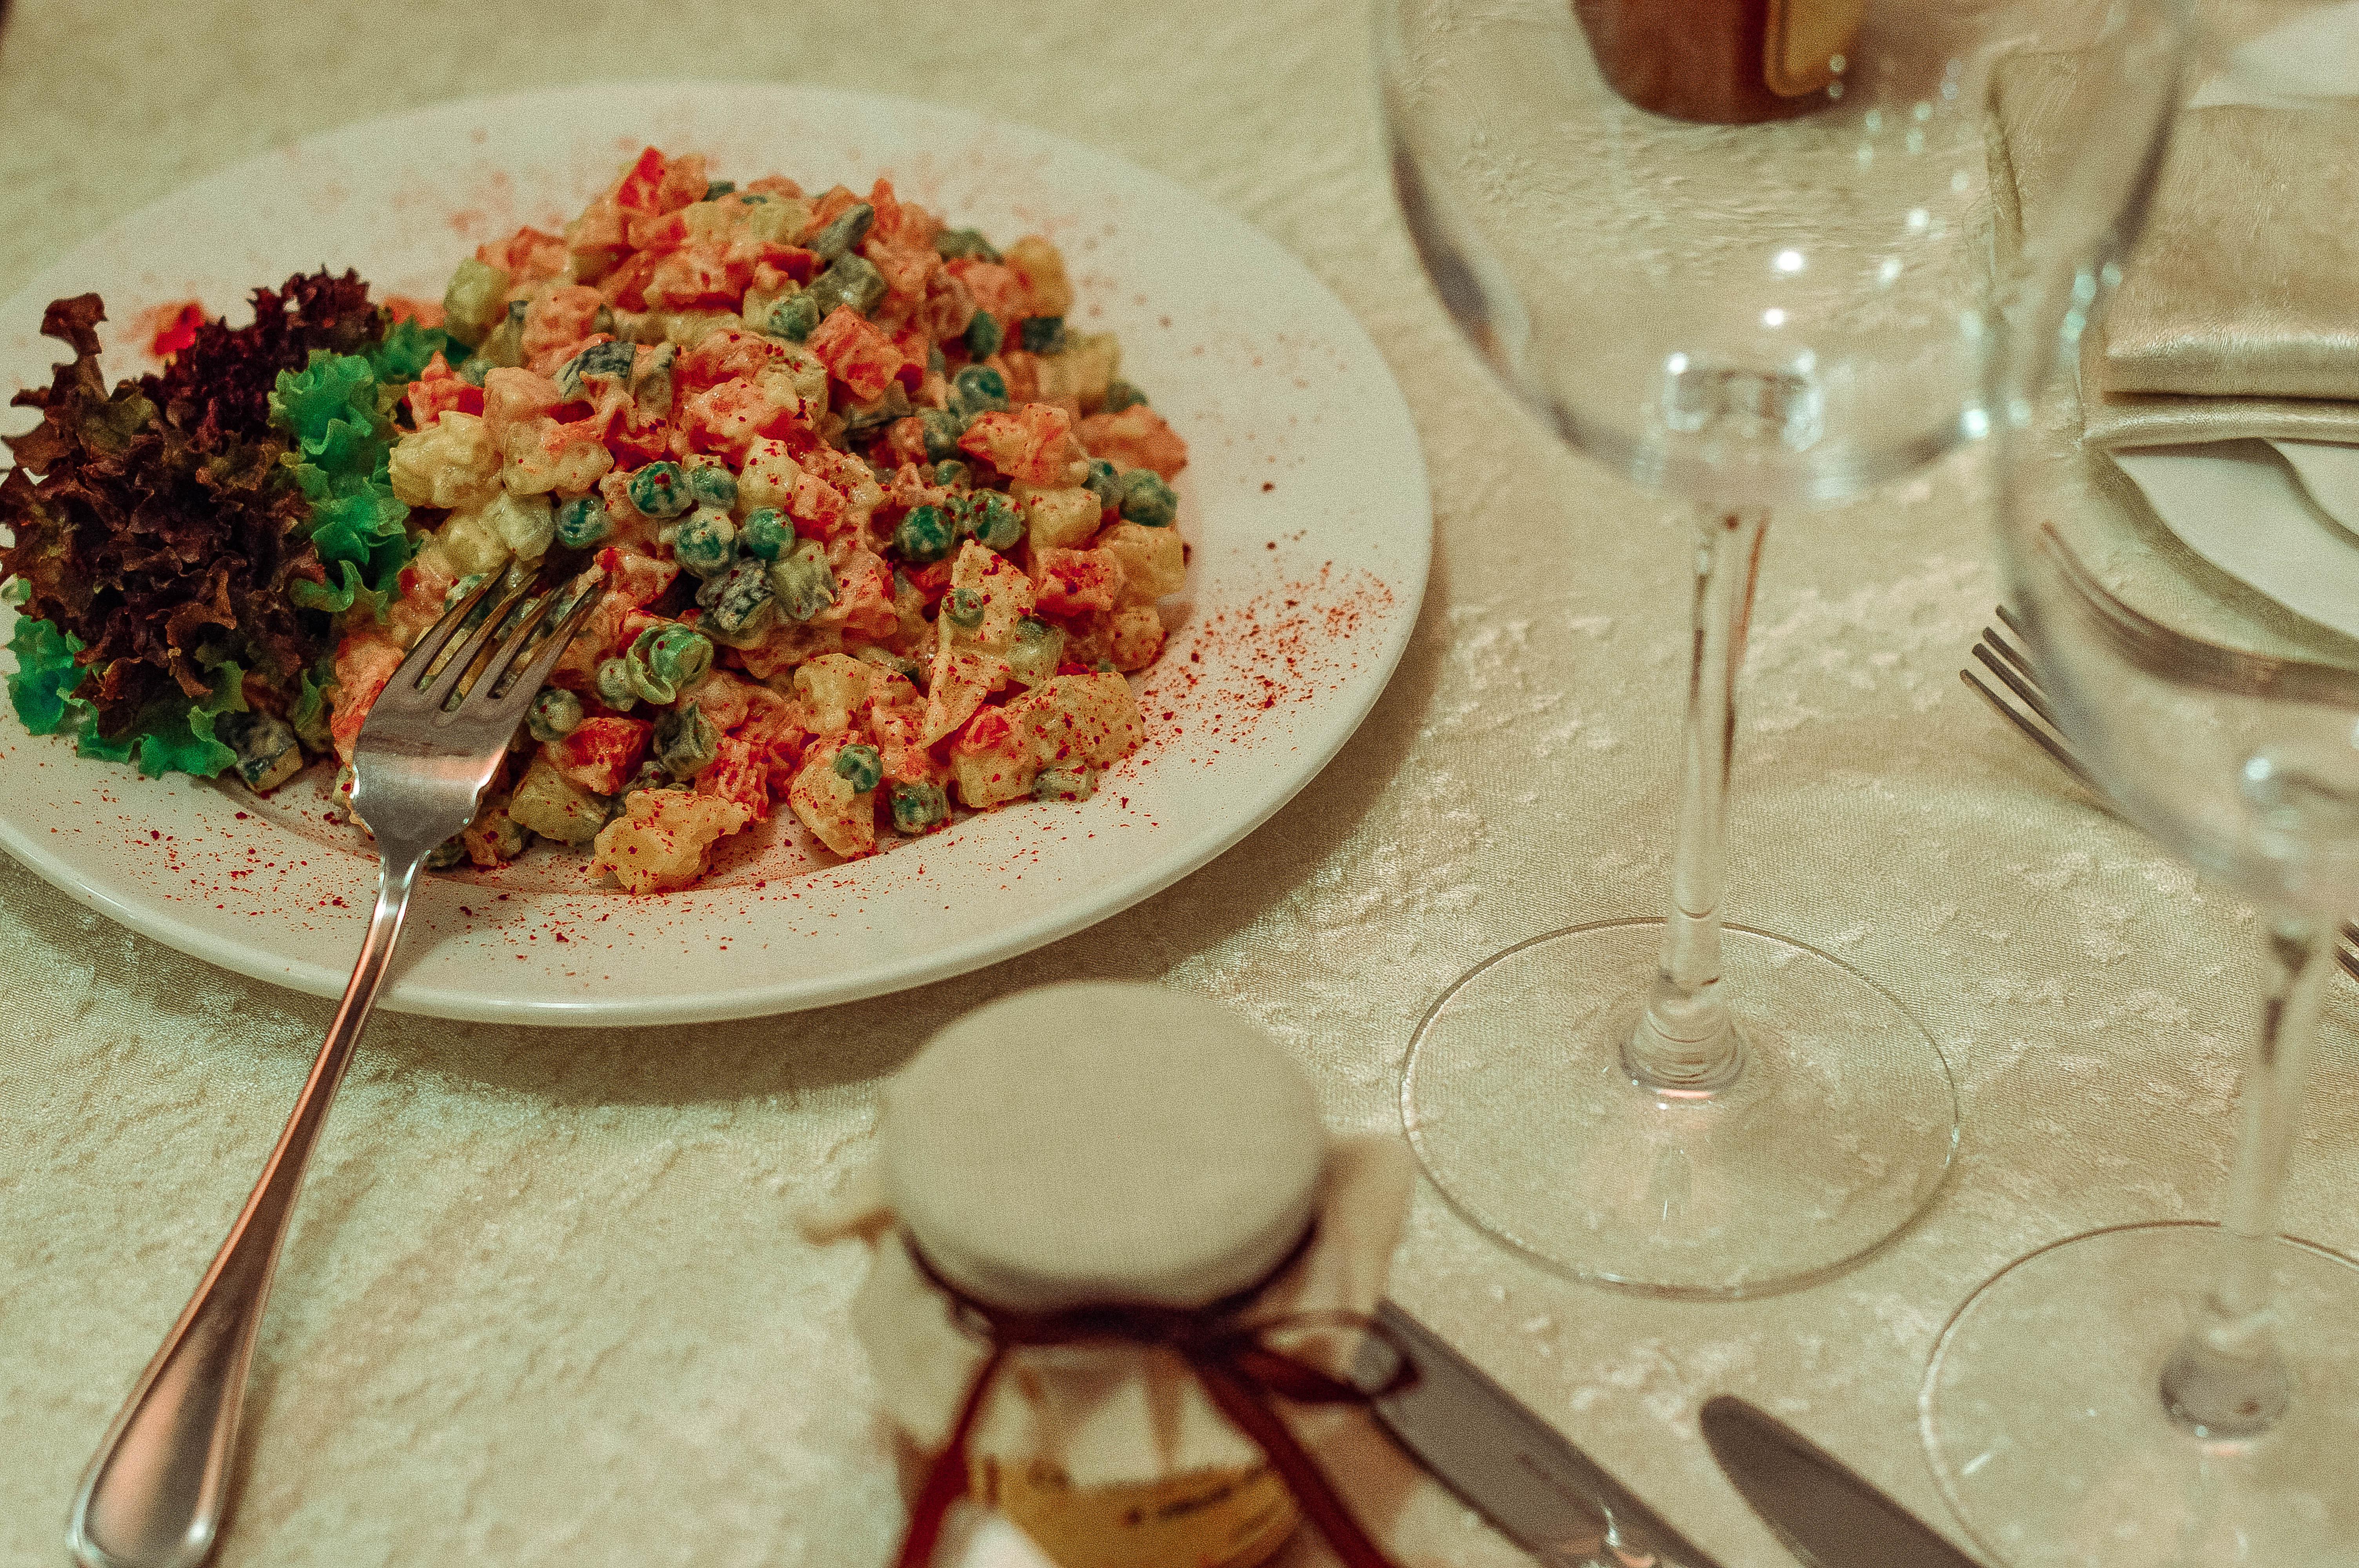 праздничный стол, еда, оливье, салат